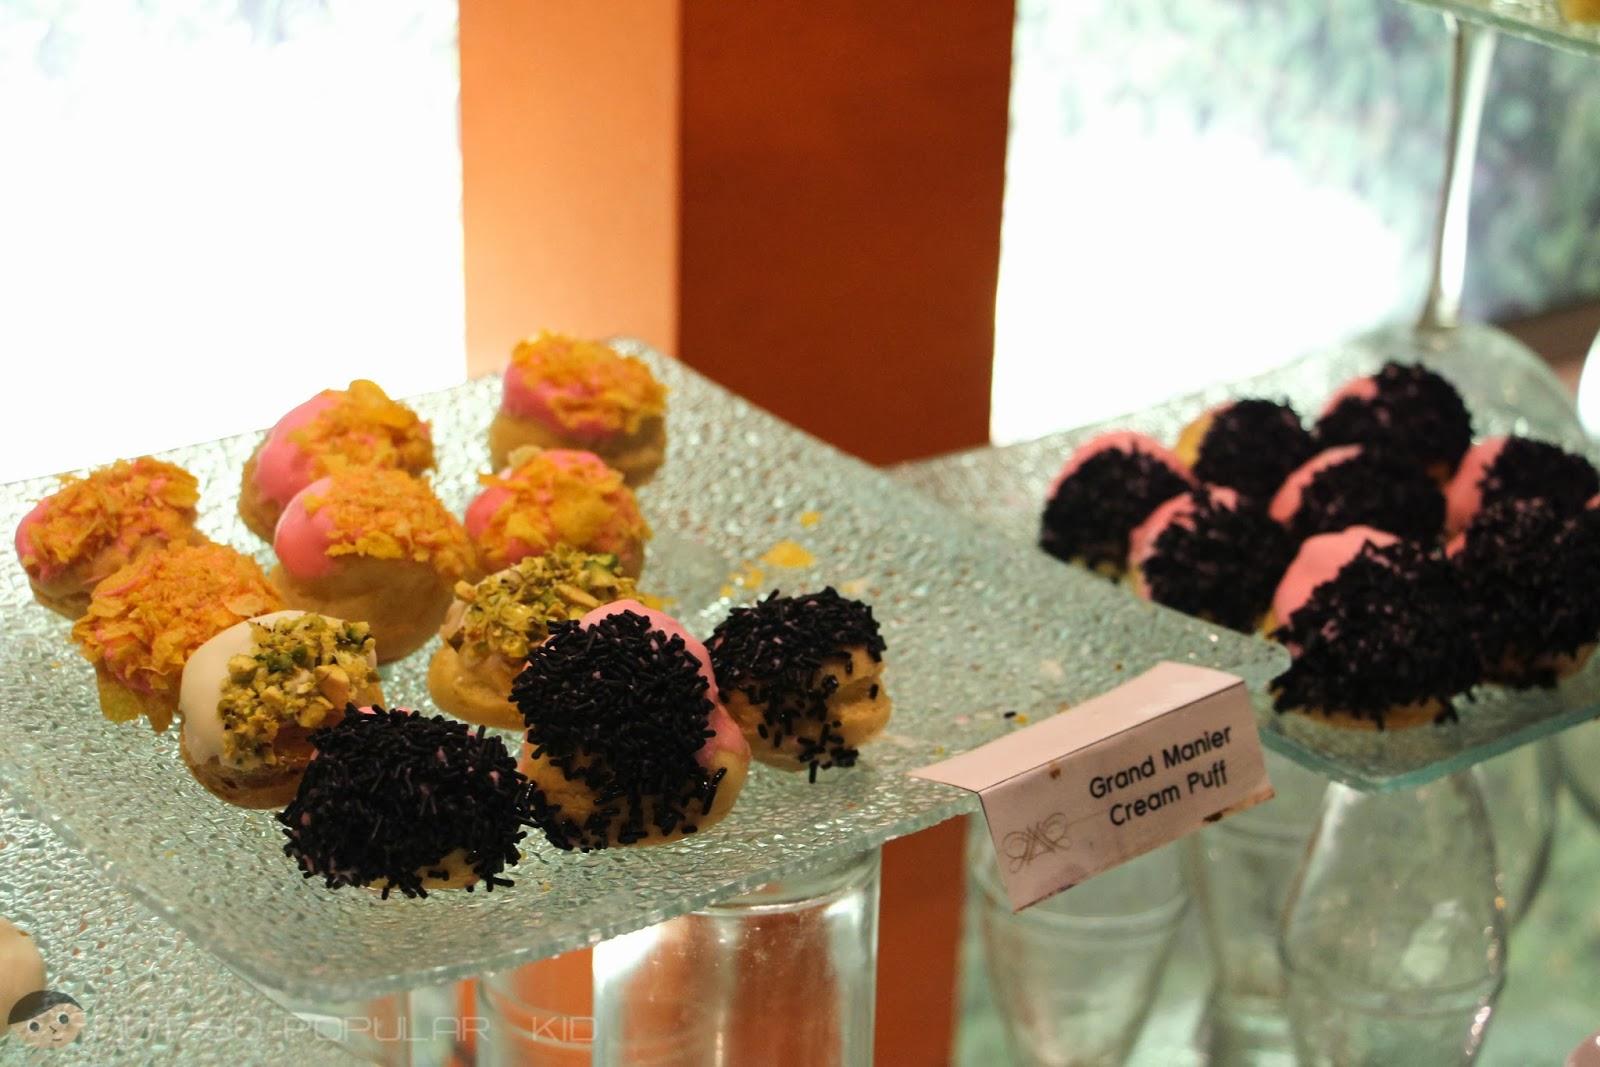 Dessert Bar Selection of Midas - Grand Manier Cream Puff